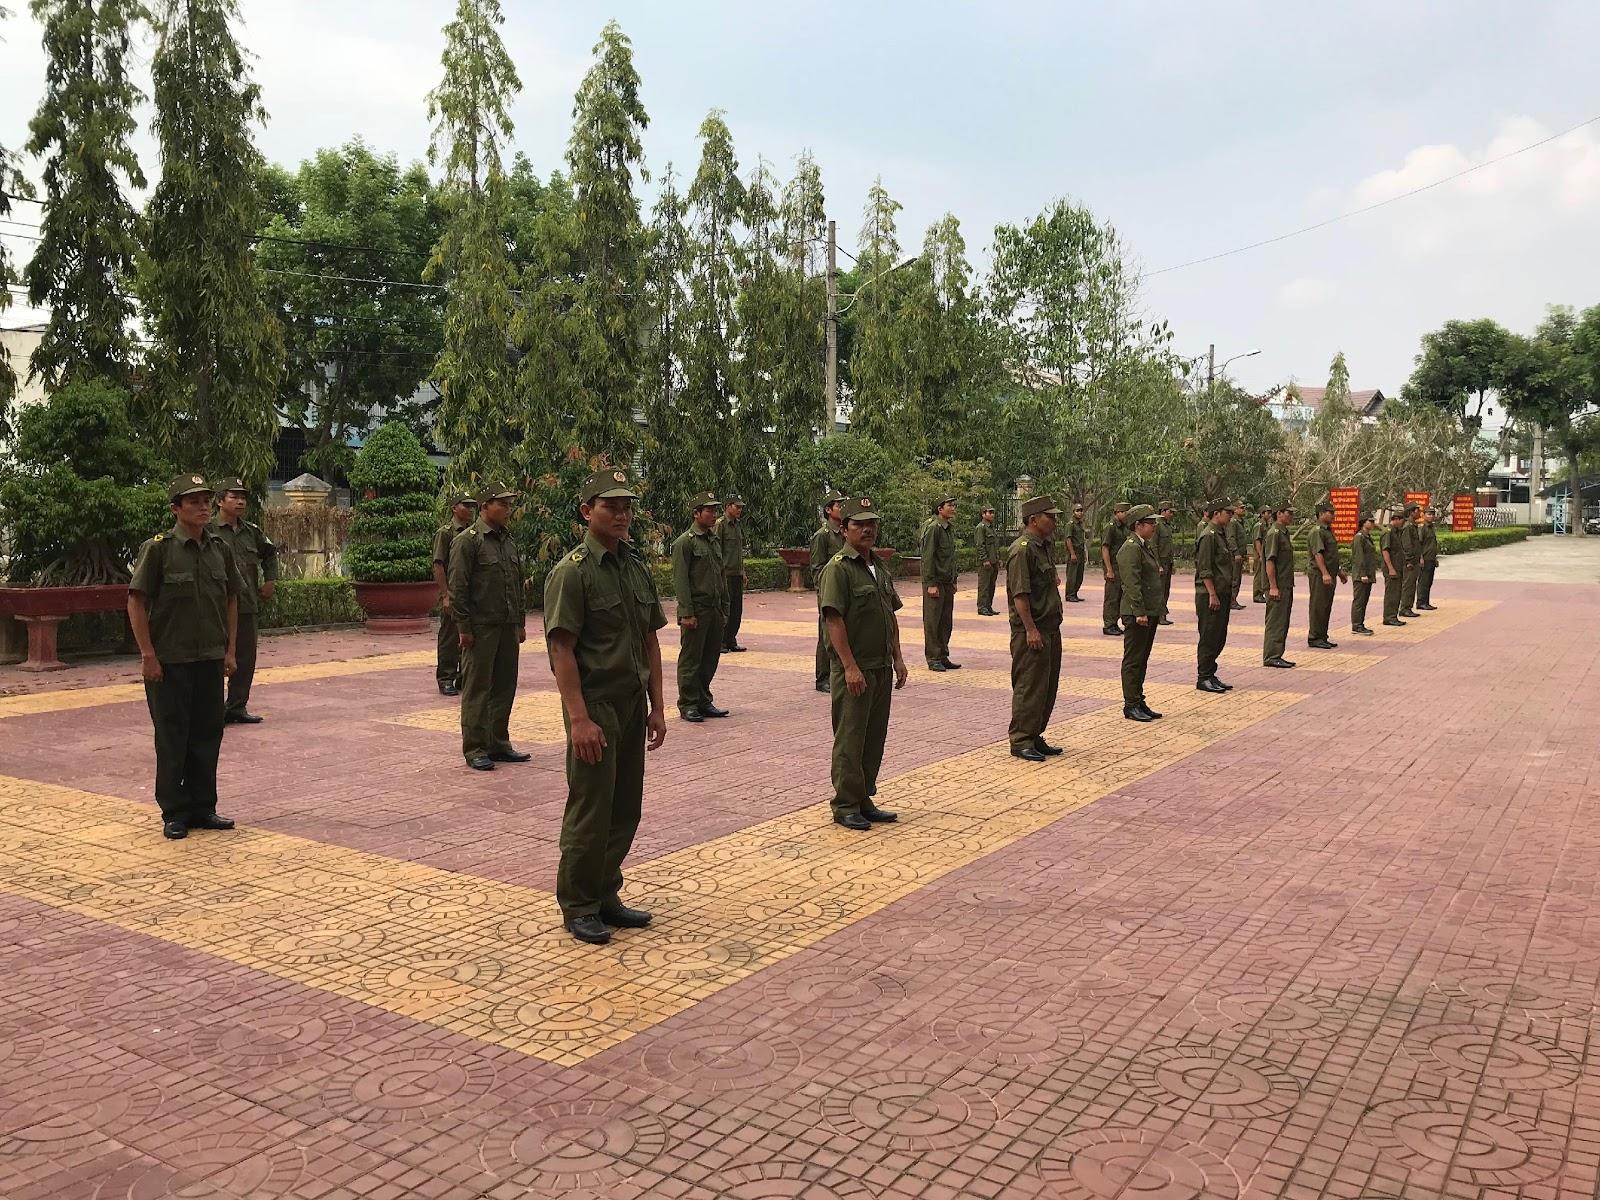 C:UsersPhu NguyenDownloadsIMG-2841 (1).JPG